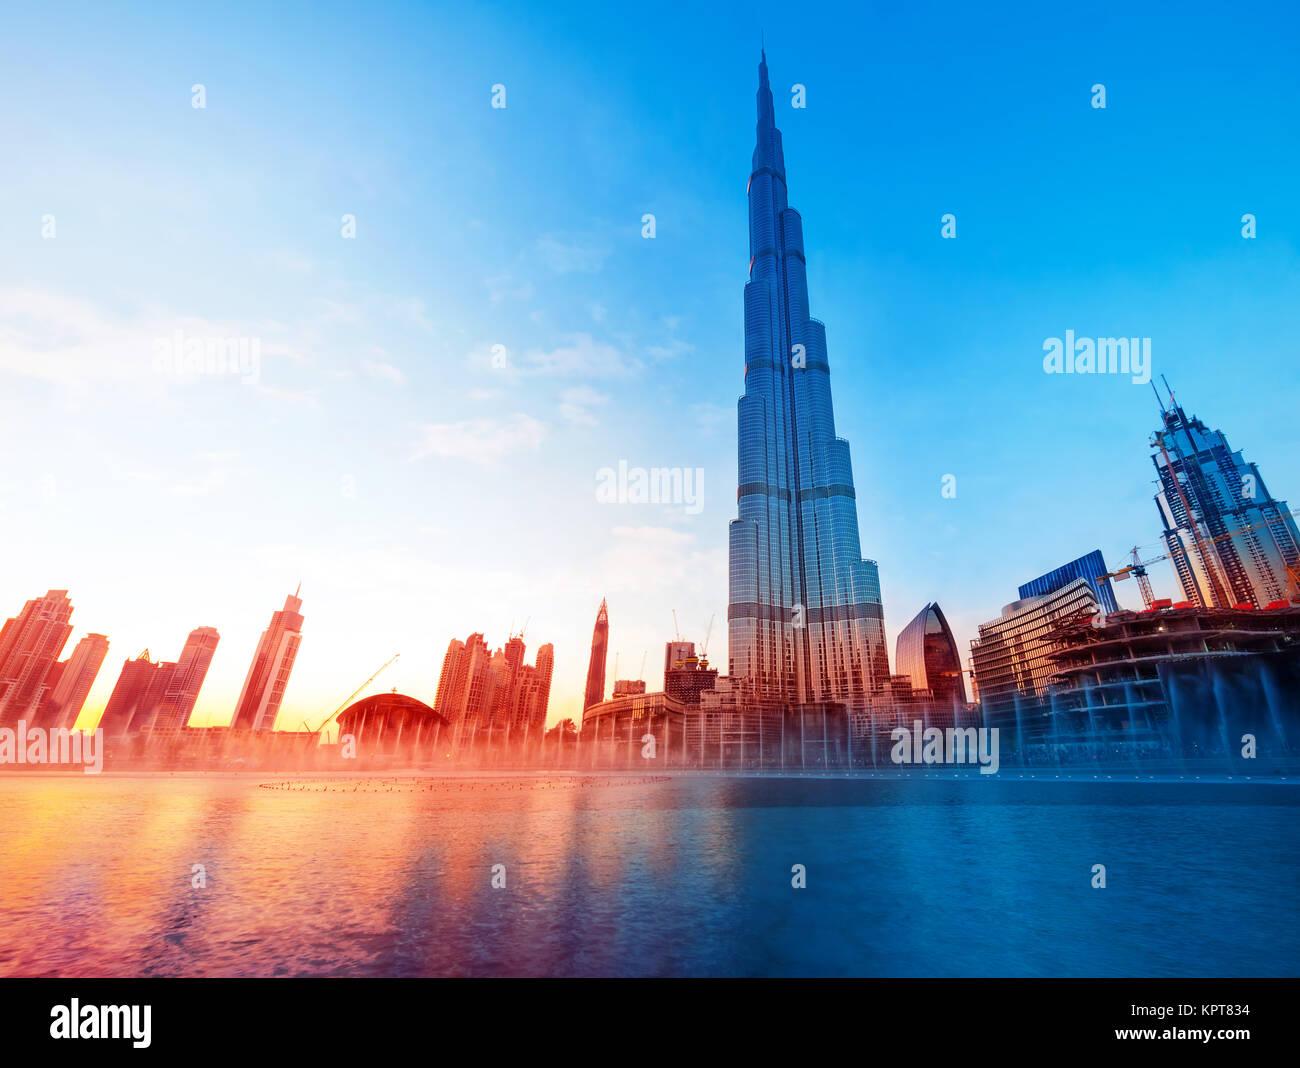 Burj Khalifa Dubai's Landmark - Stock Image